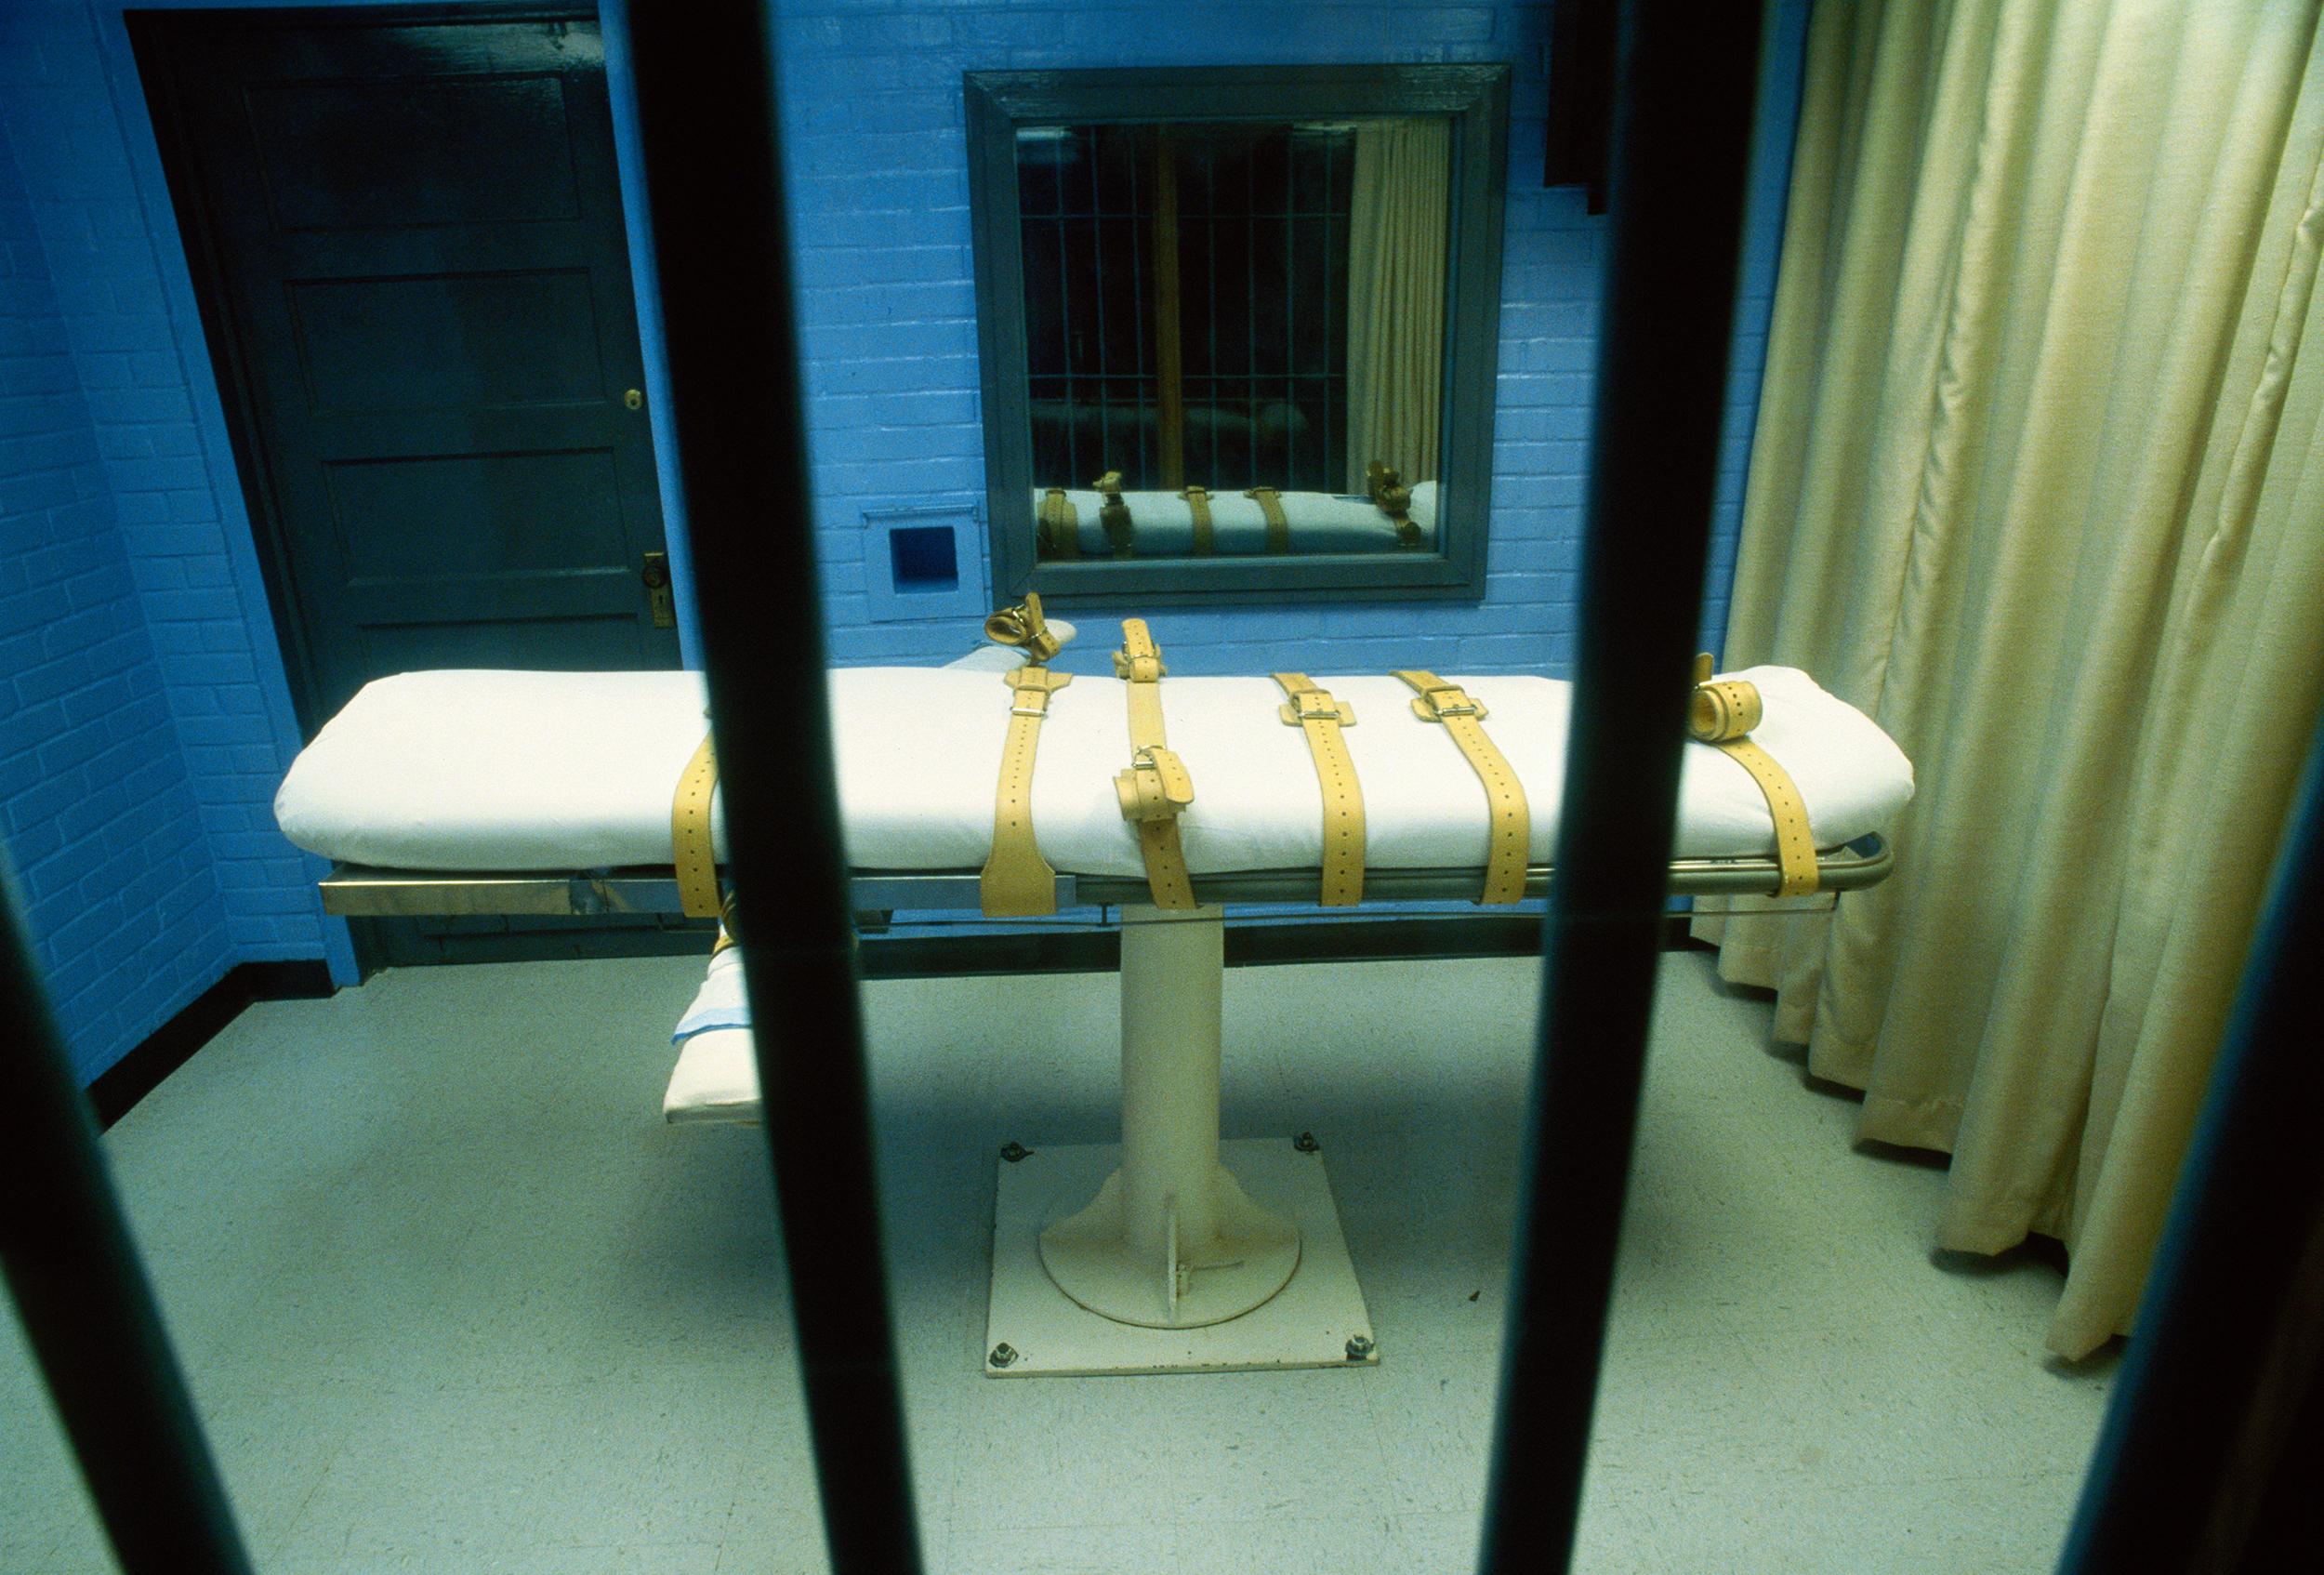 Modern types of death penalty